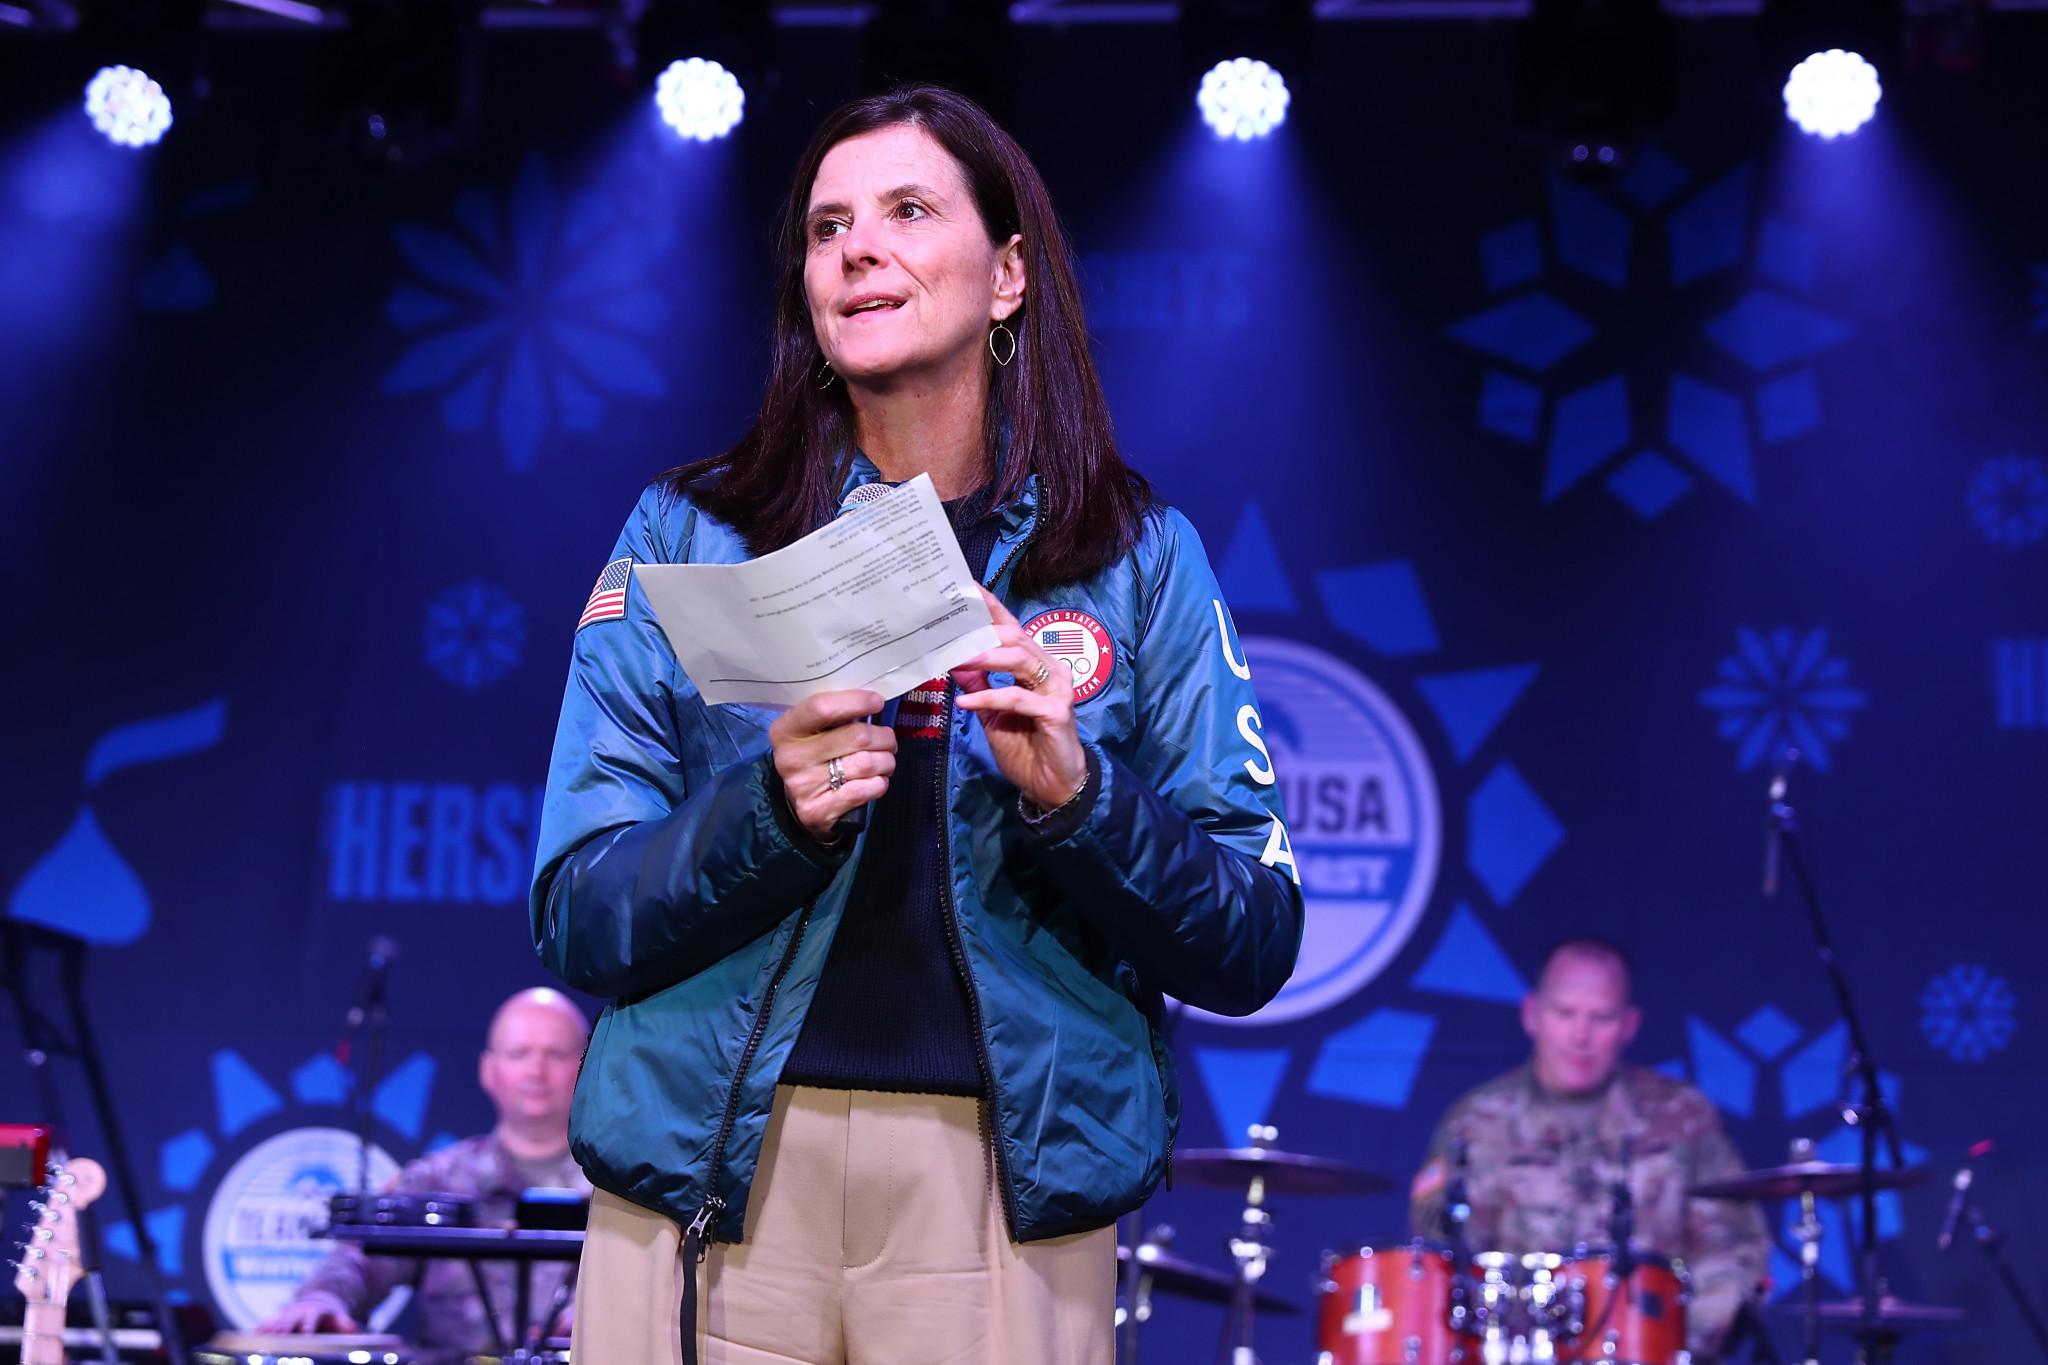 Lisa Baird struck numerous deals on behalf of USOC ©Getty Images